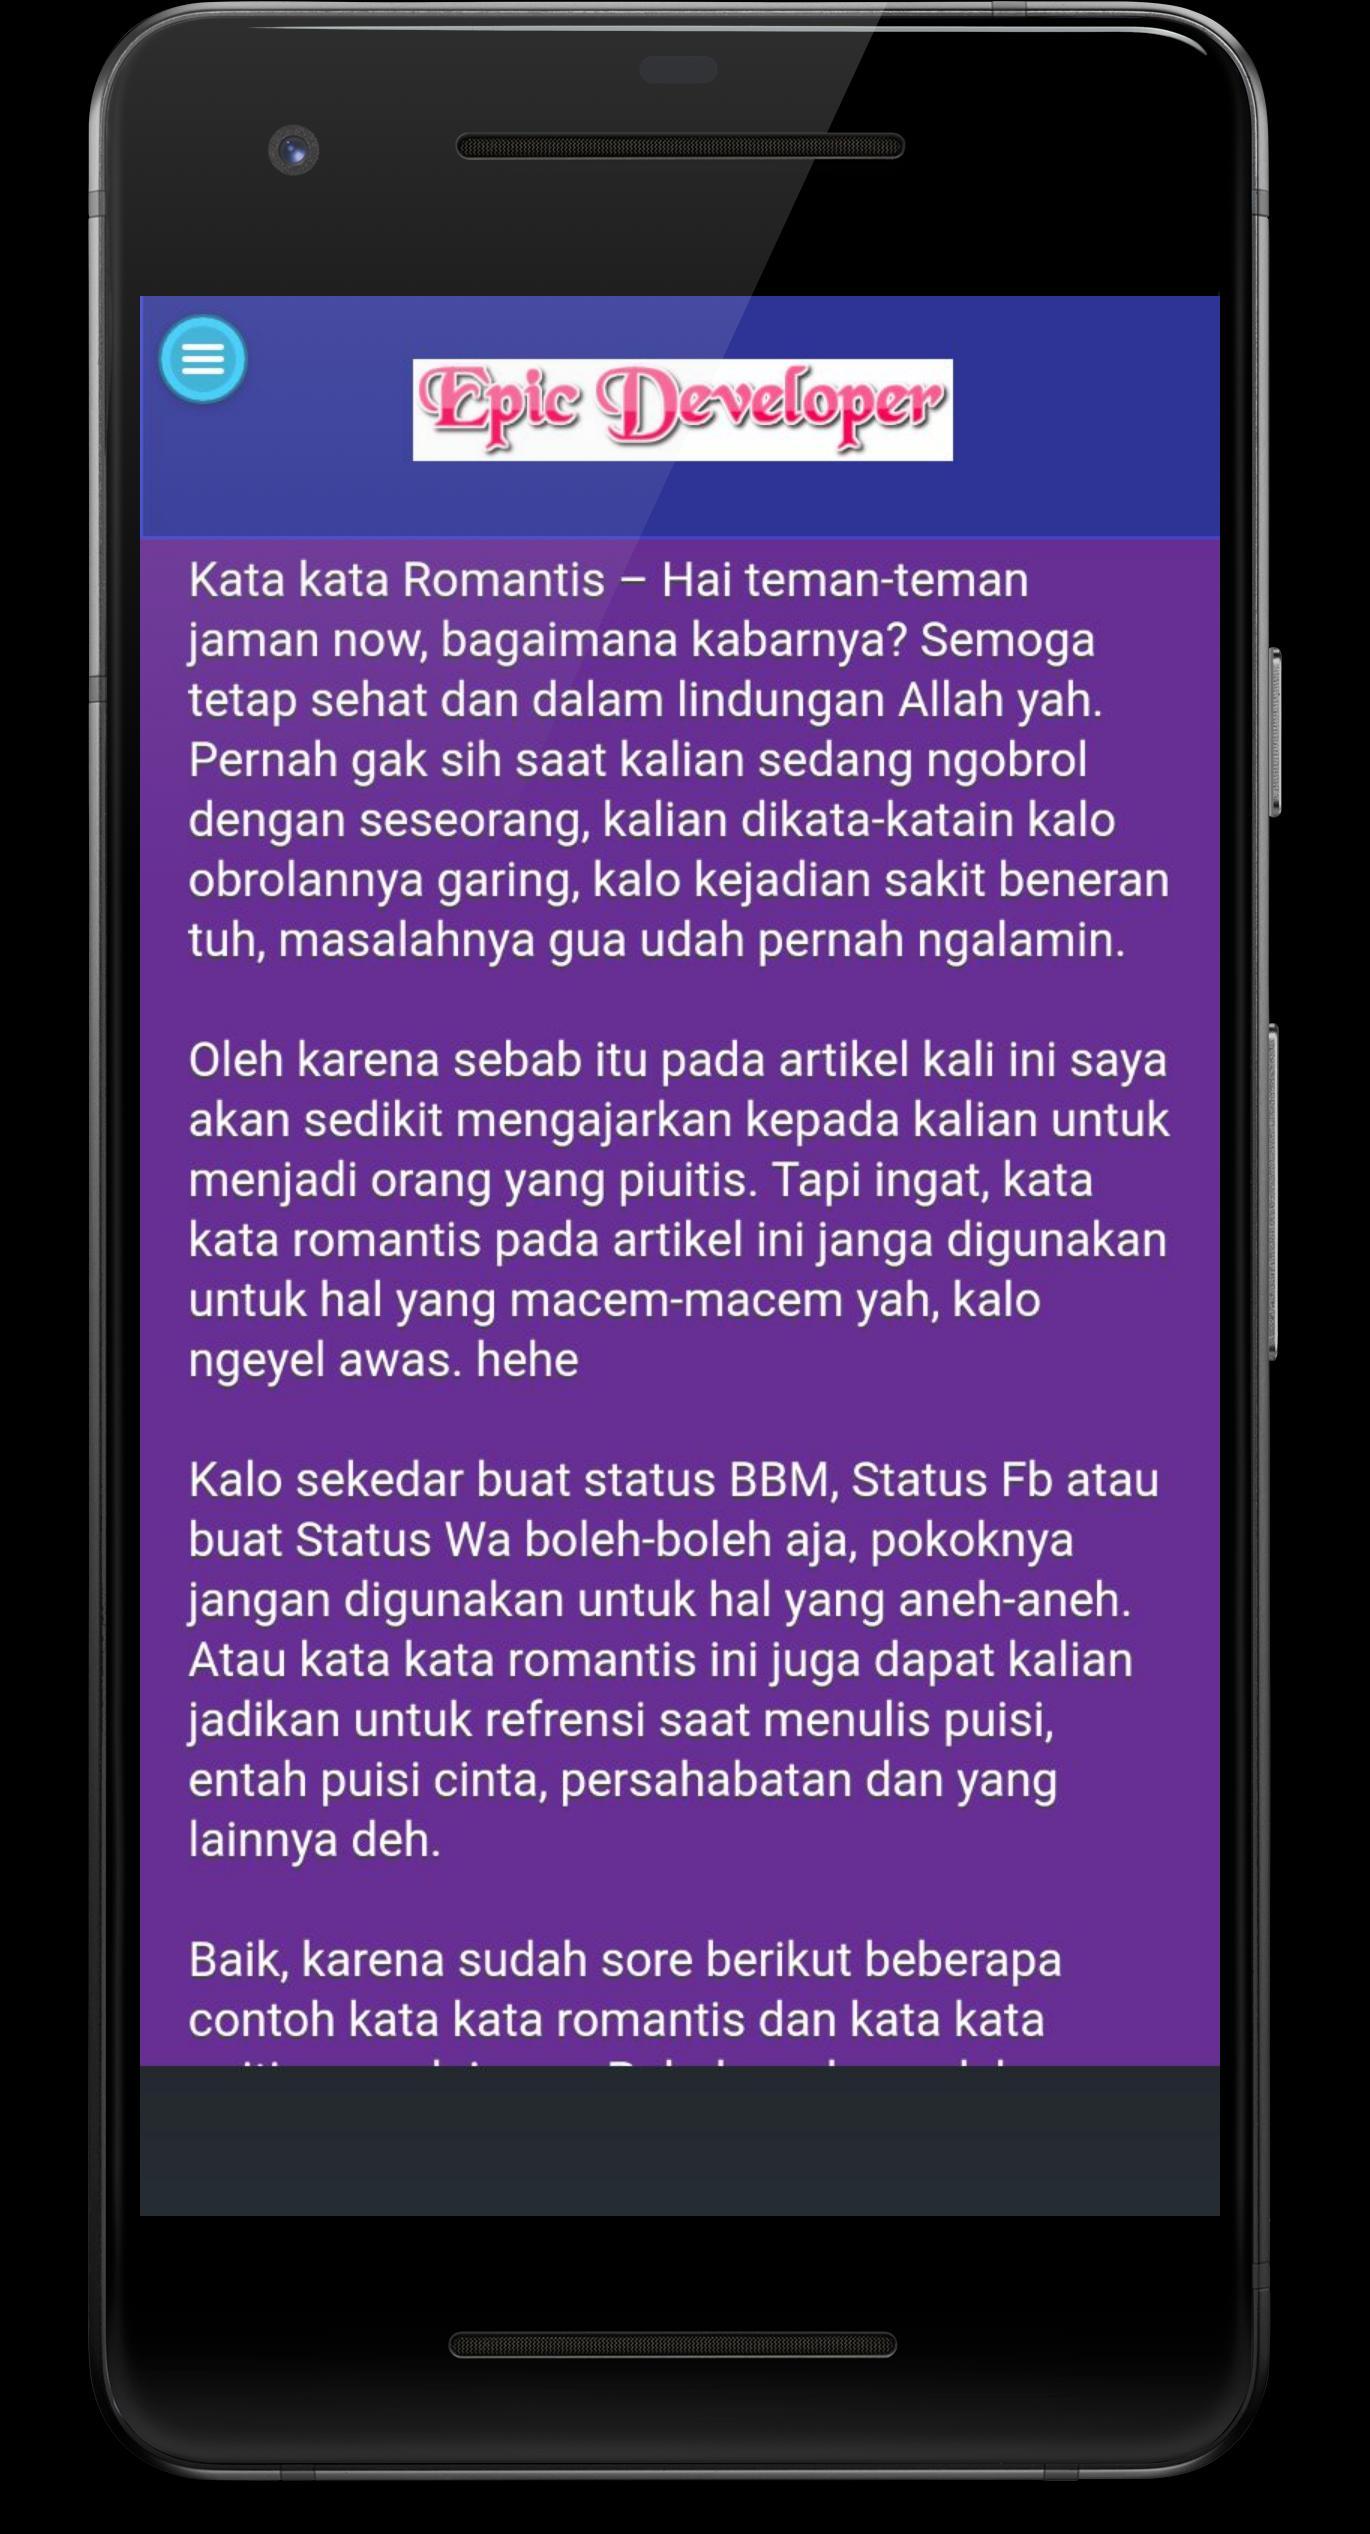 Kumpulan Kata Kata Romantis Indah Cinta Move On For Android